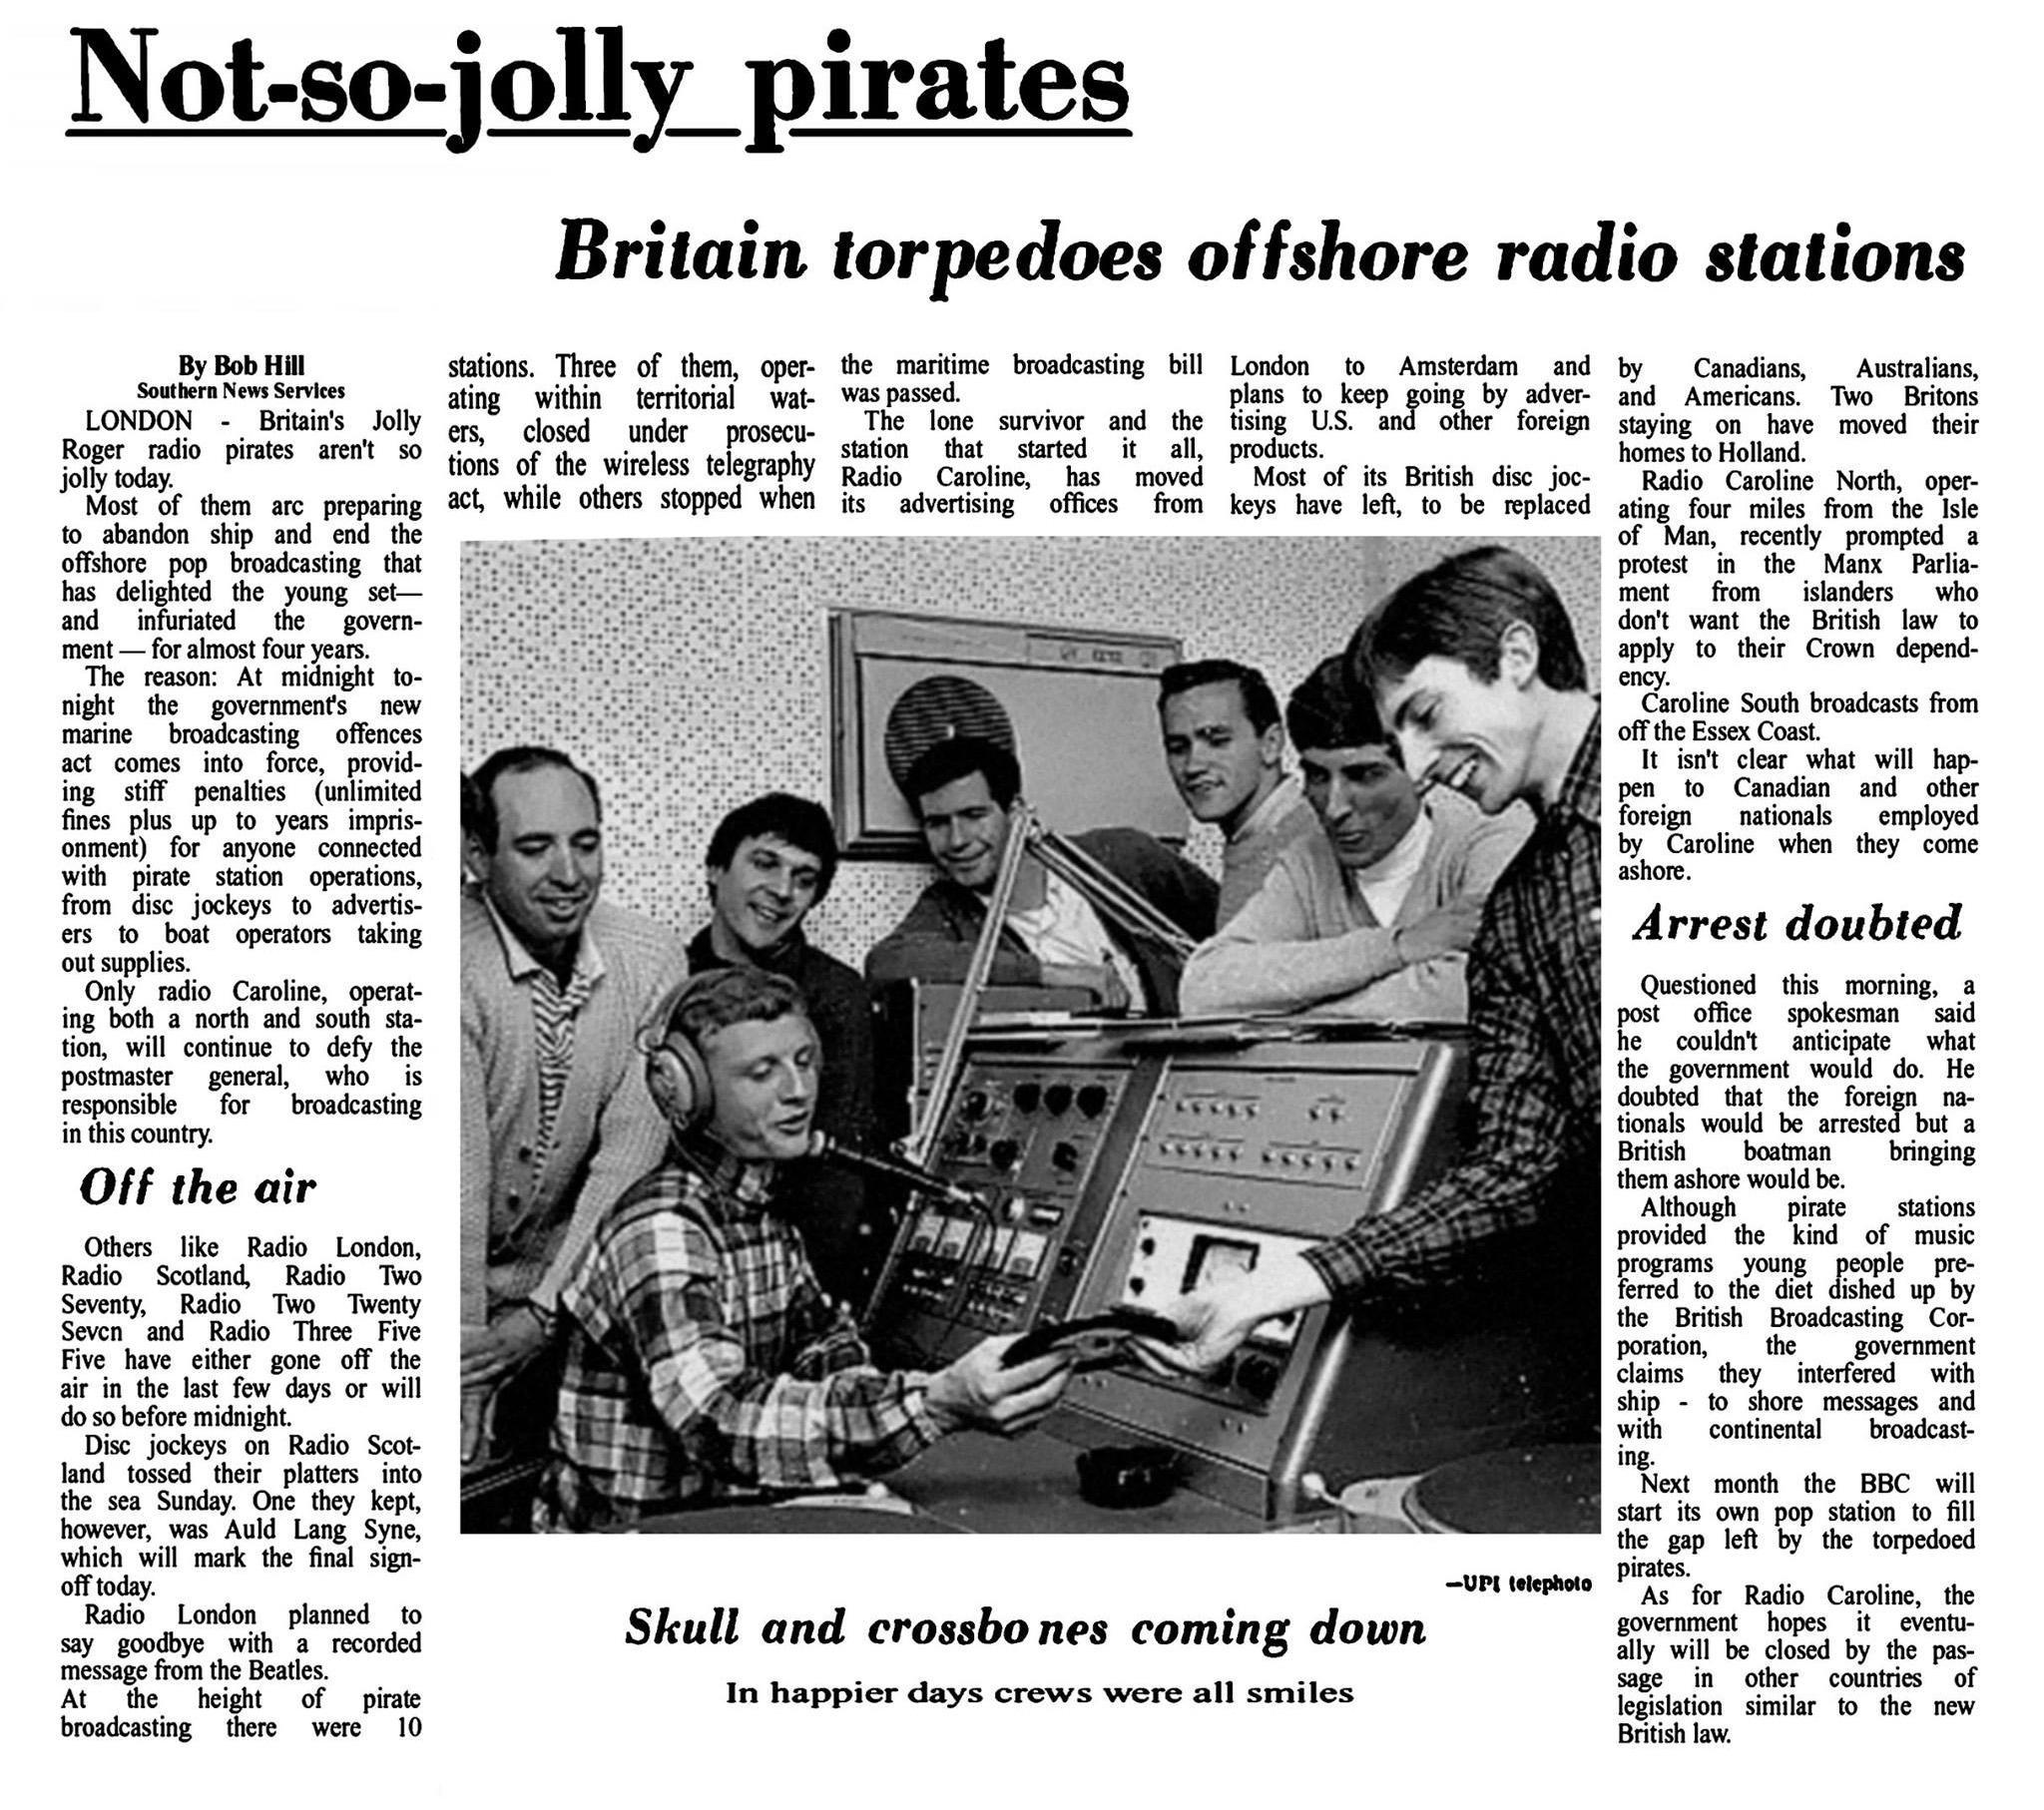 19670804 Ottawa Citizen Britain torpedoes offshore radio stations.jpg